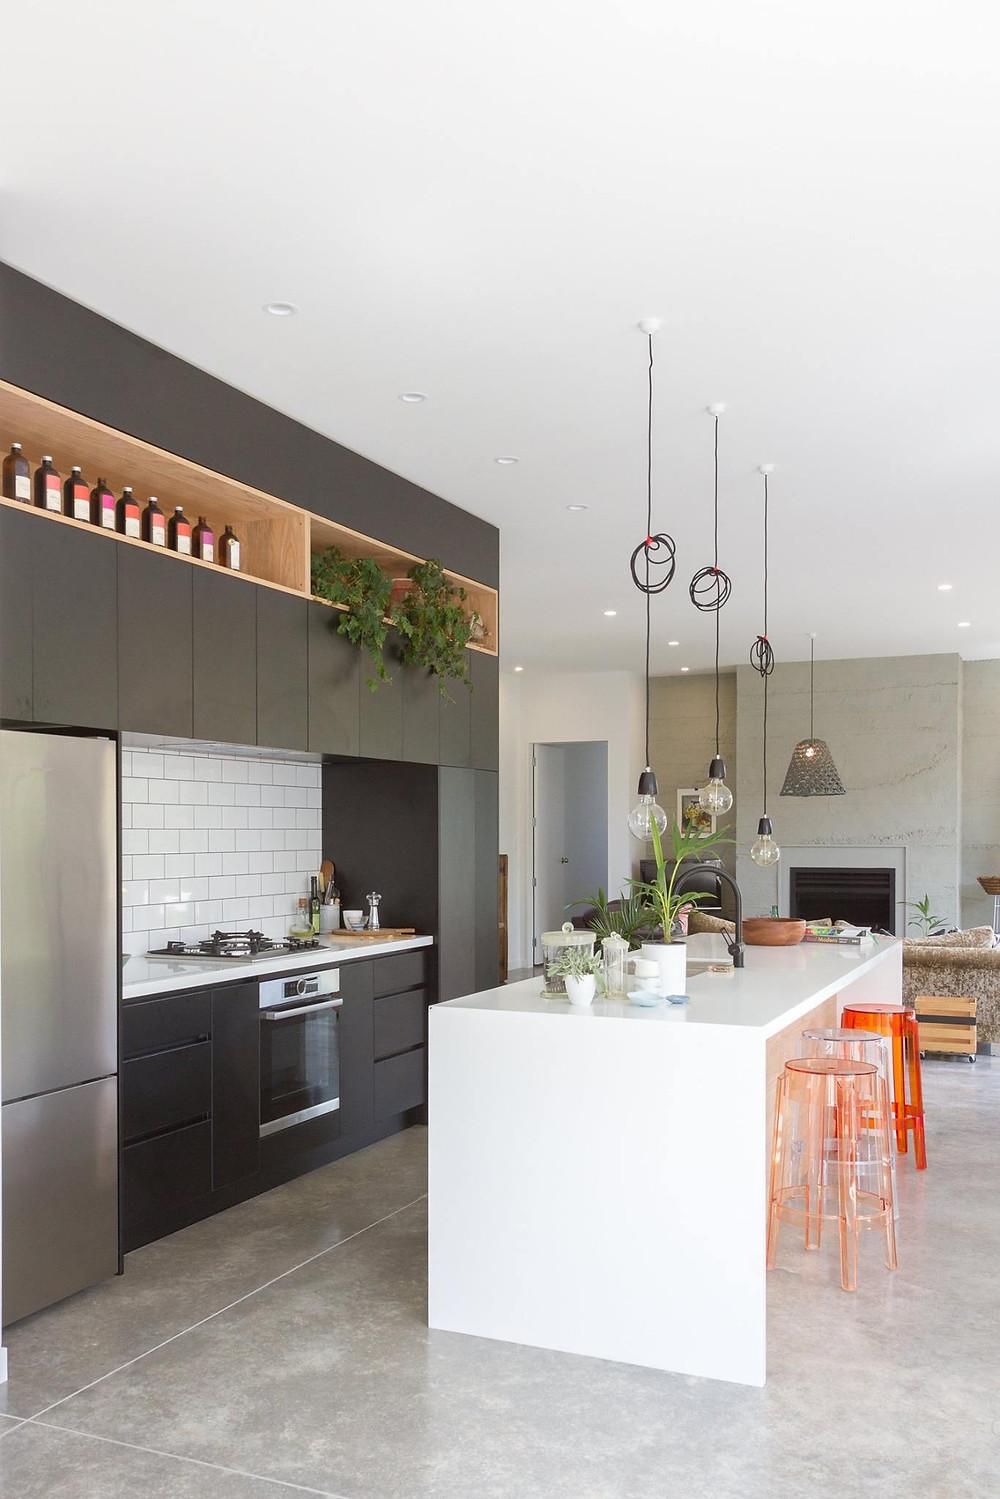 A Victoria Read Architecture designed kitchen in Greytown